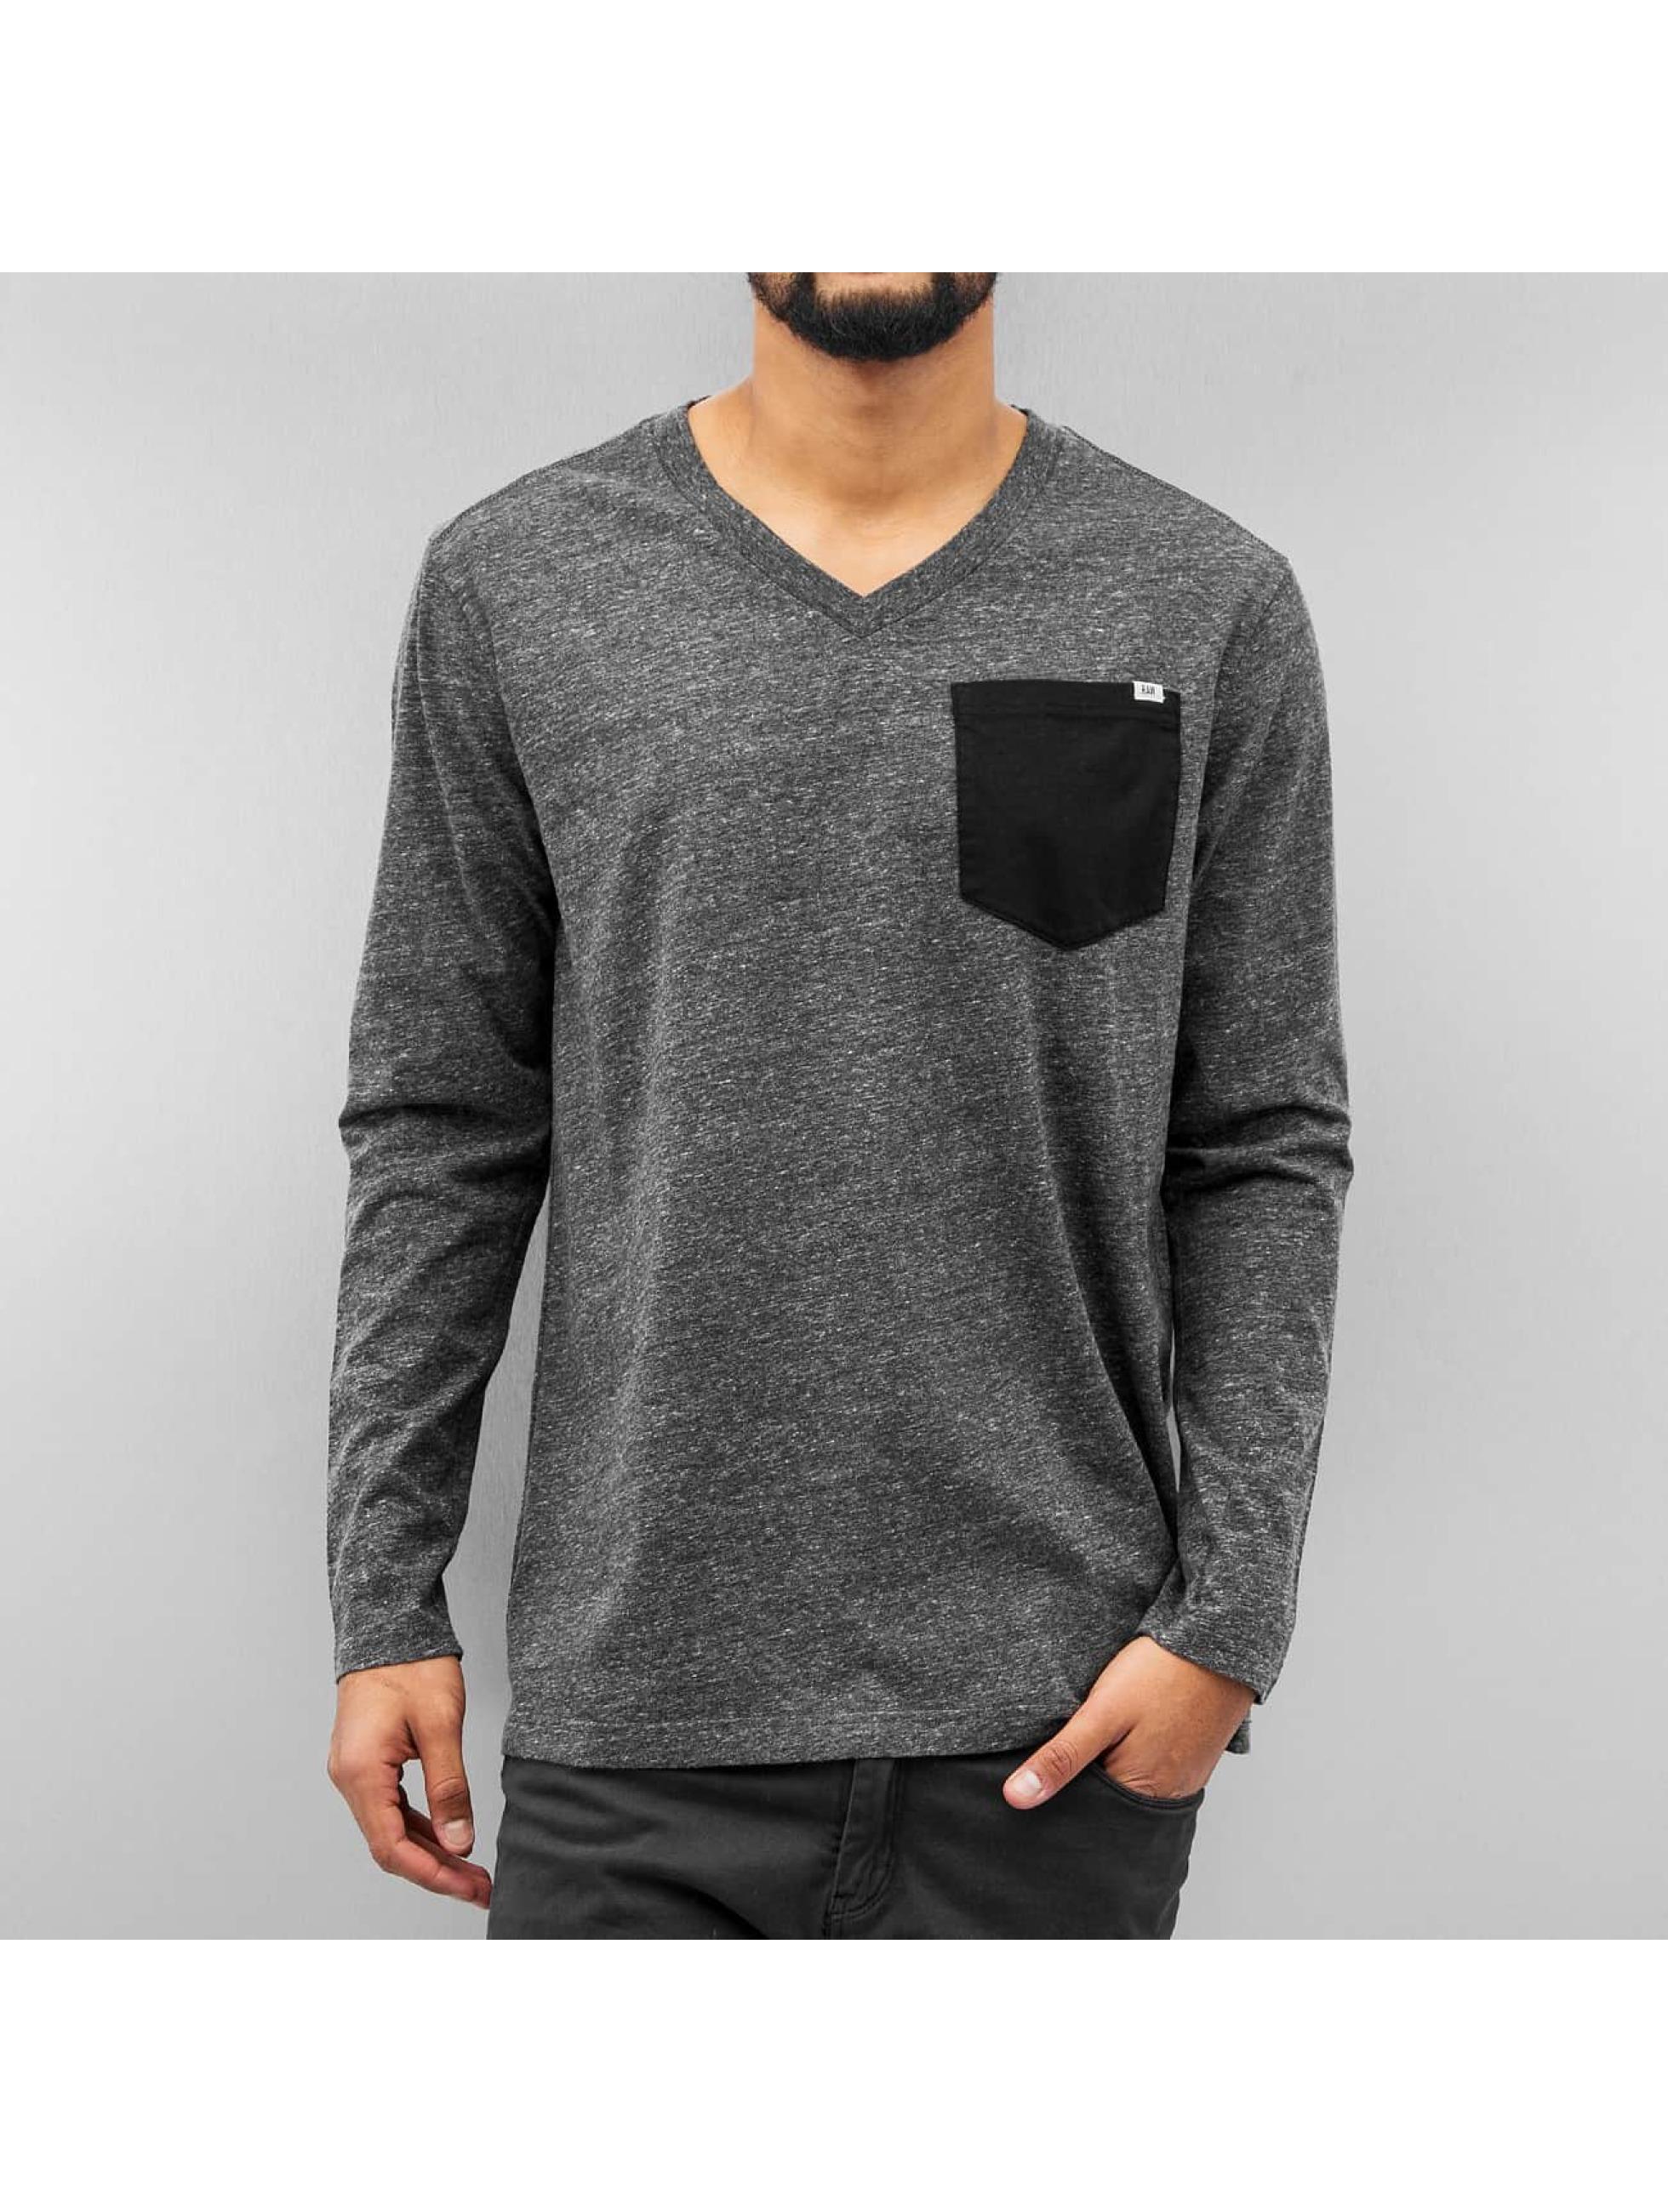 G-Star Longsleeve Riban Pocket Premium Compact Jersey grijs